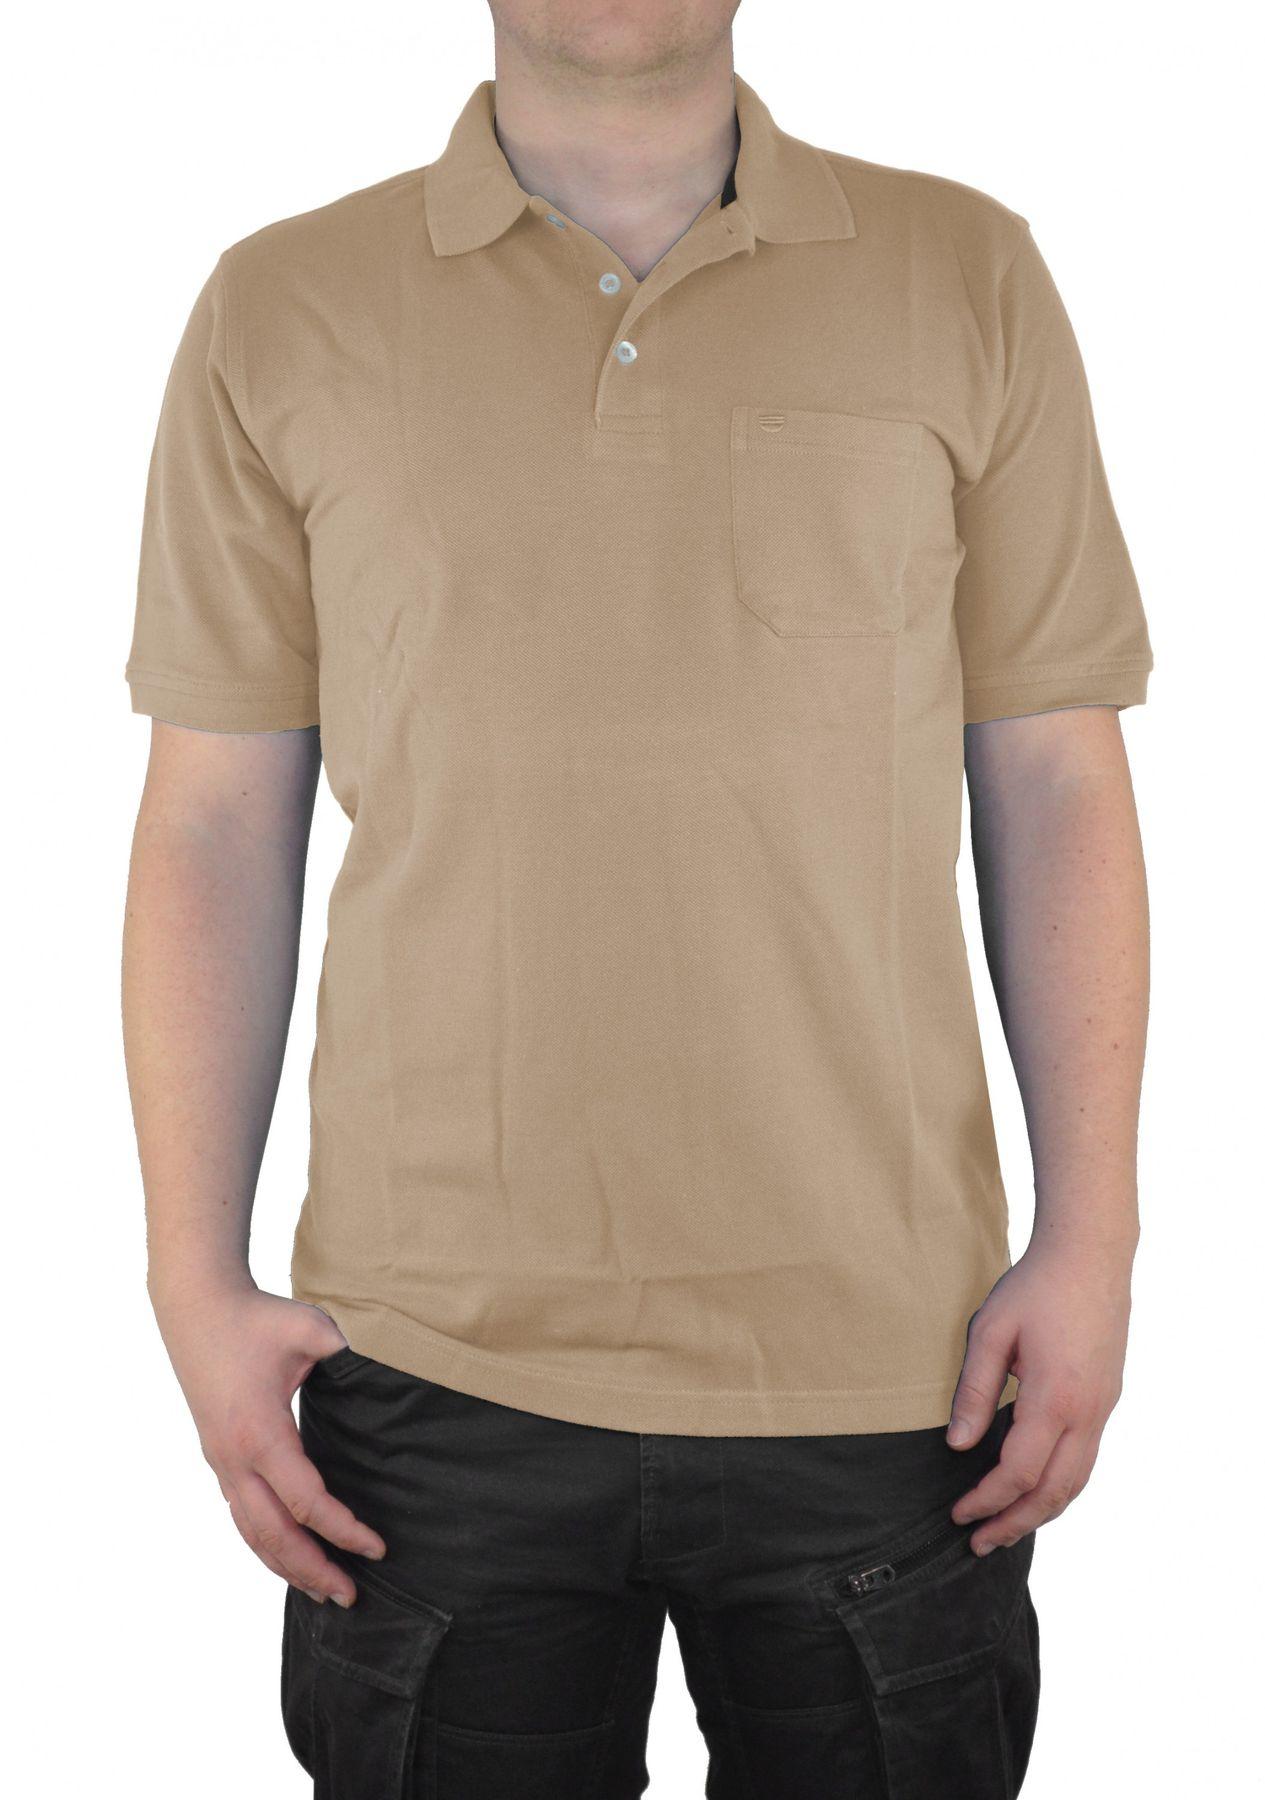 Redmond - Regular Fit - Herren Polo Shirt in verschiedenen Farben (900 A) – Bild 15